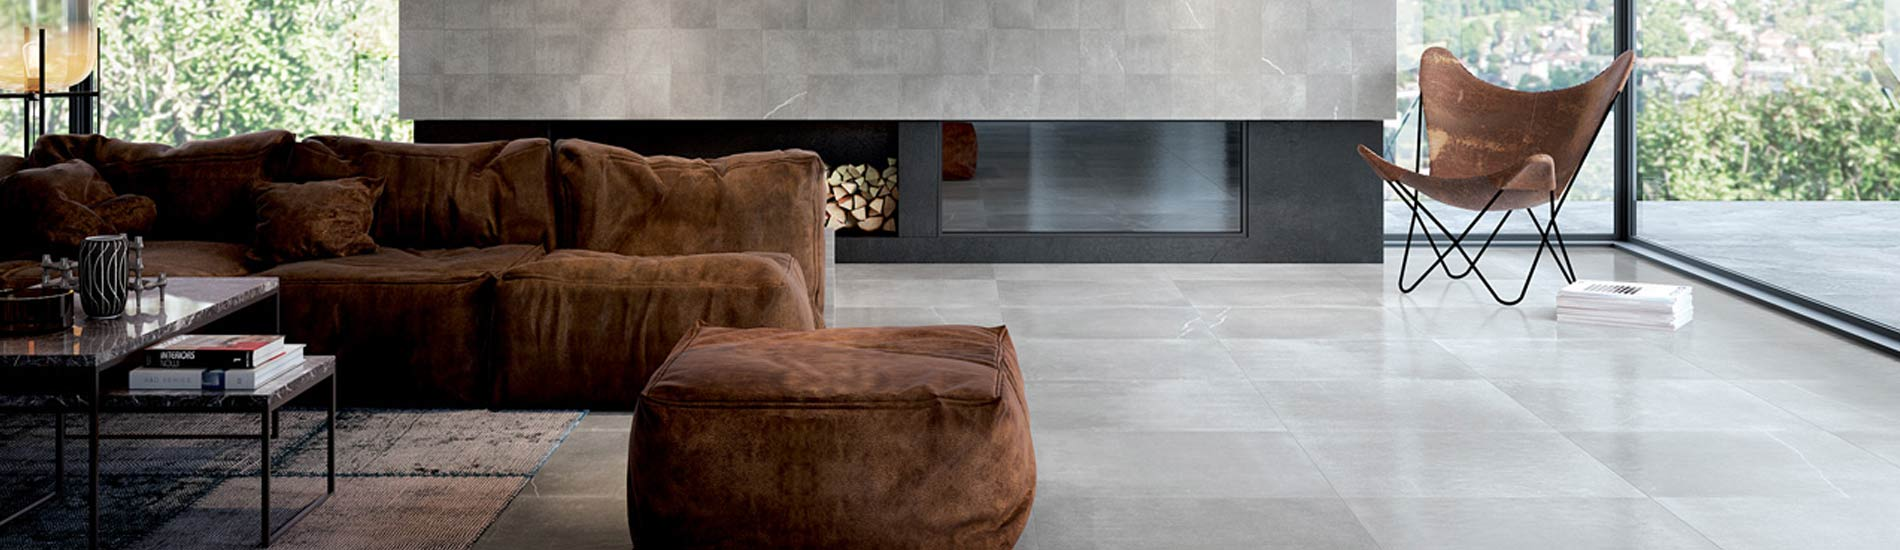 Banner-Maku-natural-stone-floor-wall-tile-fap-ceramiche